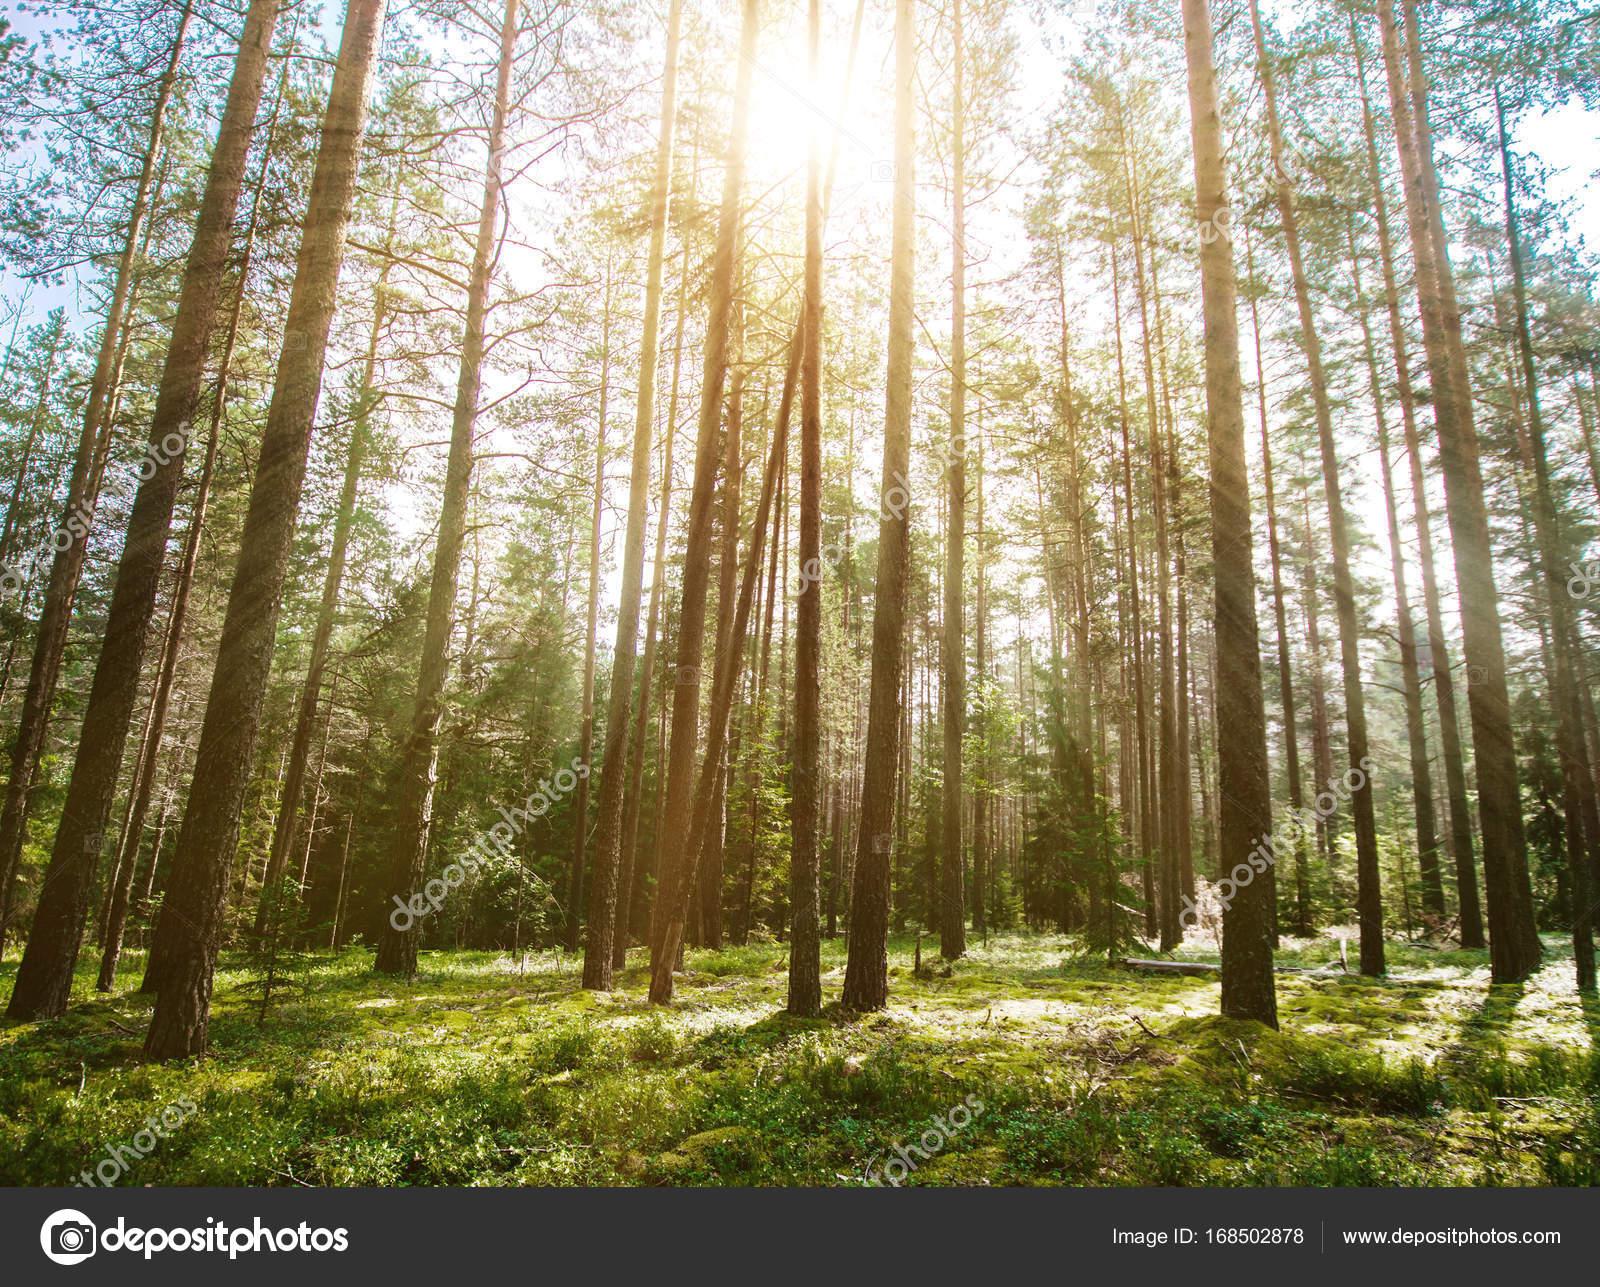 Planten En Bomen : Bos. wilde planten en bomen u2014 stockfoto © 1xpert #168502878